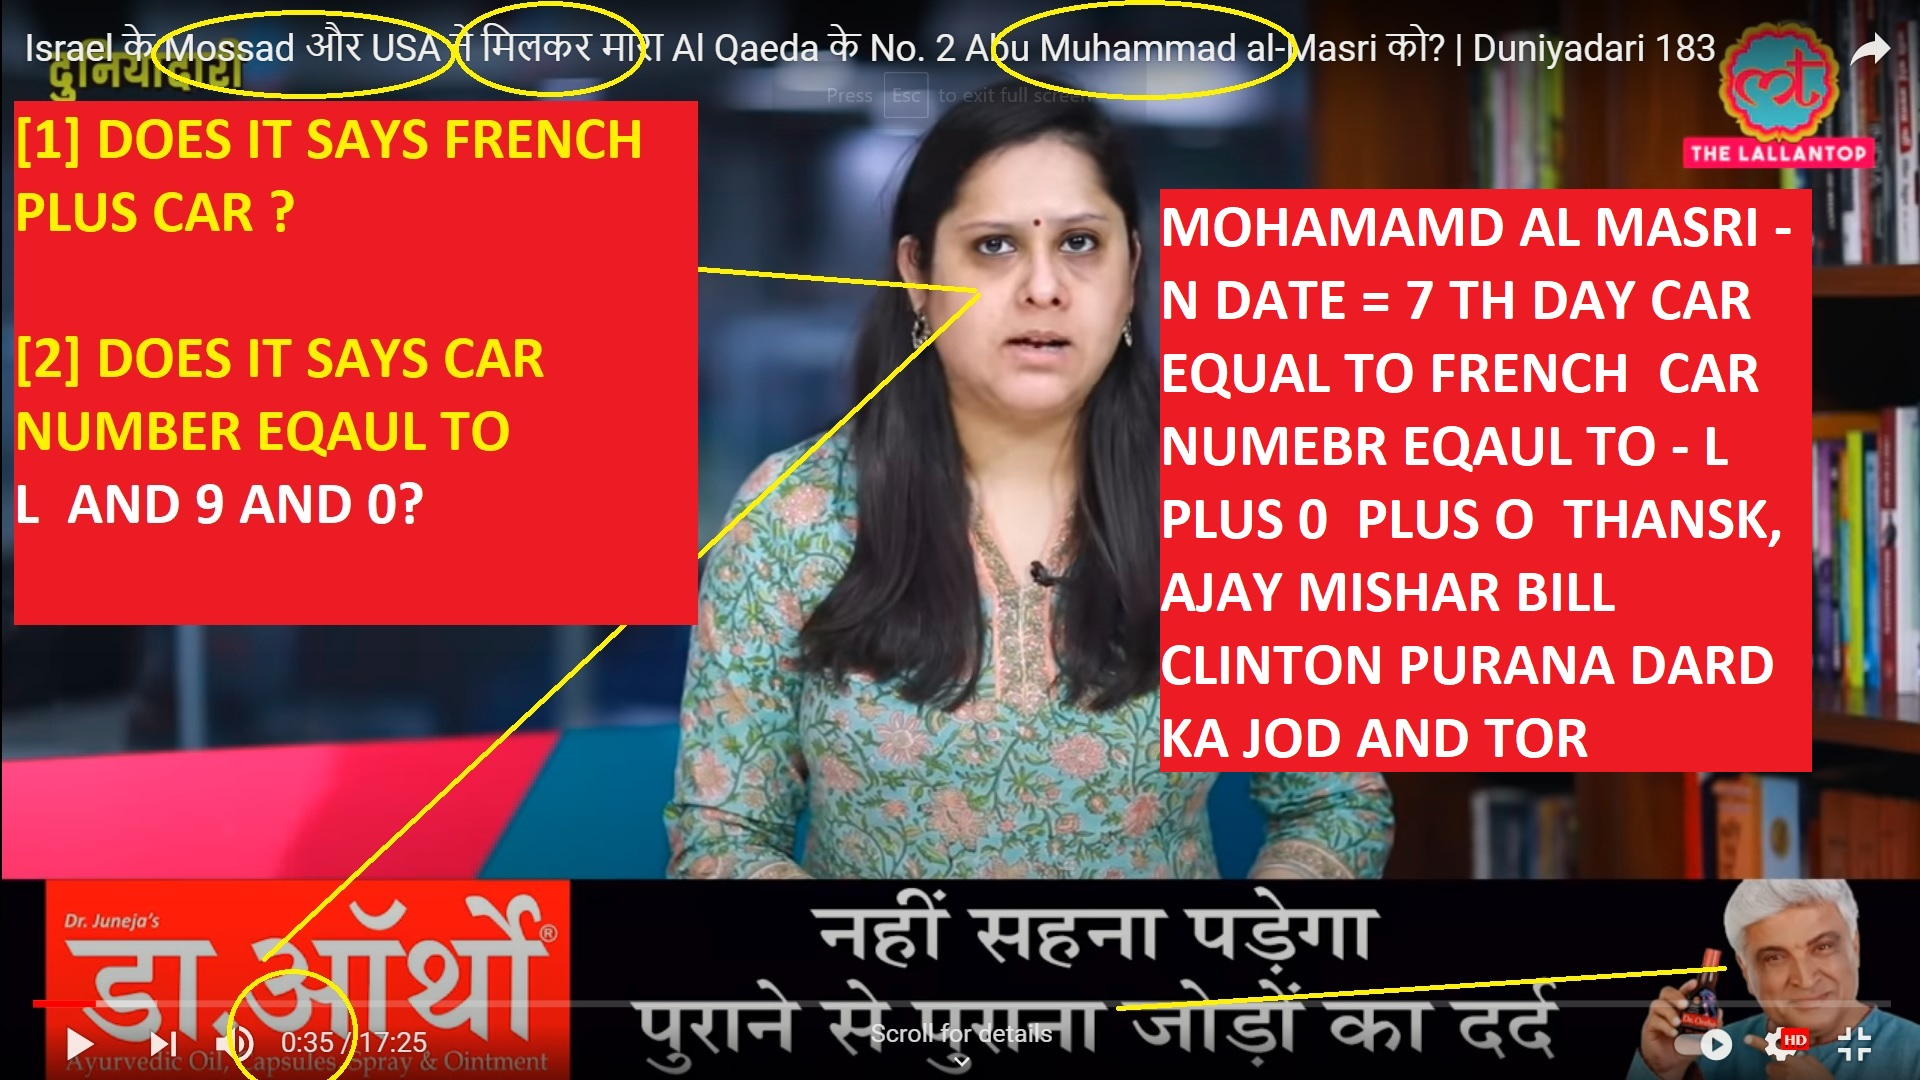 MOHAMAMD AL MASRI - N DATE = 7 TH DAY CAR EQUAL TO FRENCH CAR NUMEBR EQAUL TO - L PLUS 0 PLUS O THANSK, AJAY MISHAR BLILL CLINTON PURAMNA DARD KA JOD AND TOR